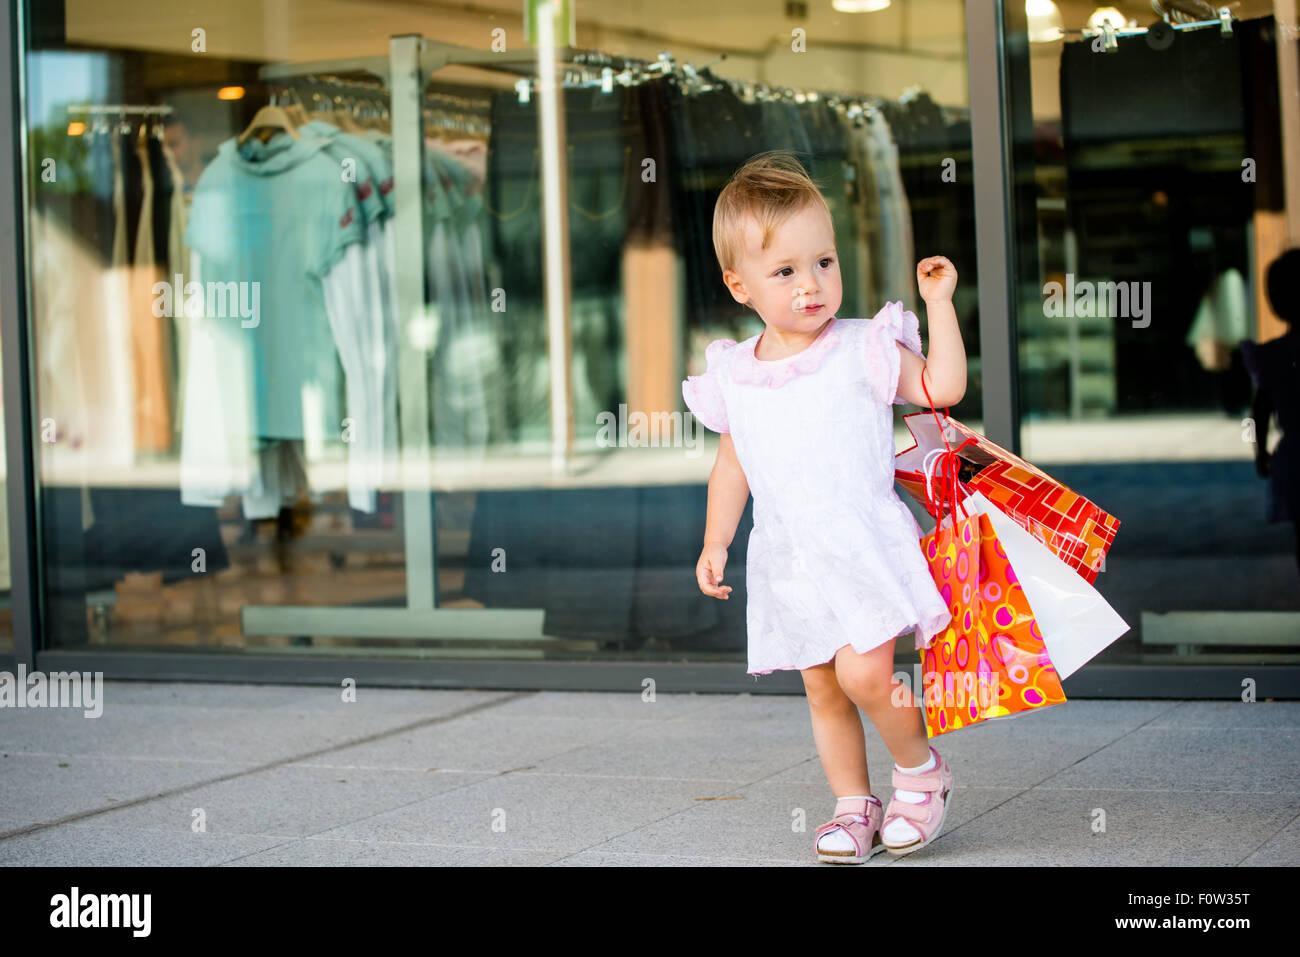 Lindo bebé pasa con bolsas de compras, tiendas en segundo plano. Imagen De Stock